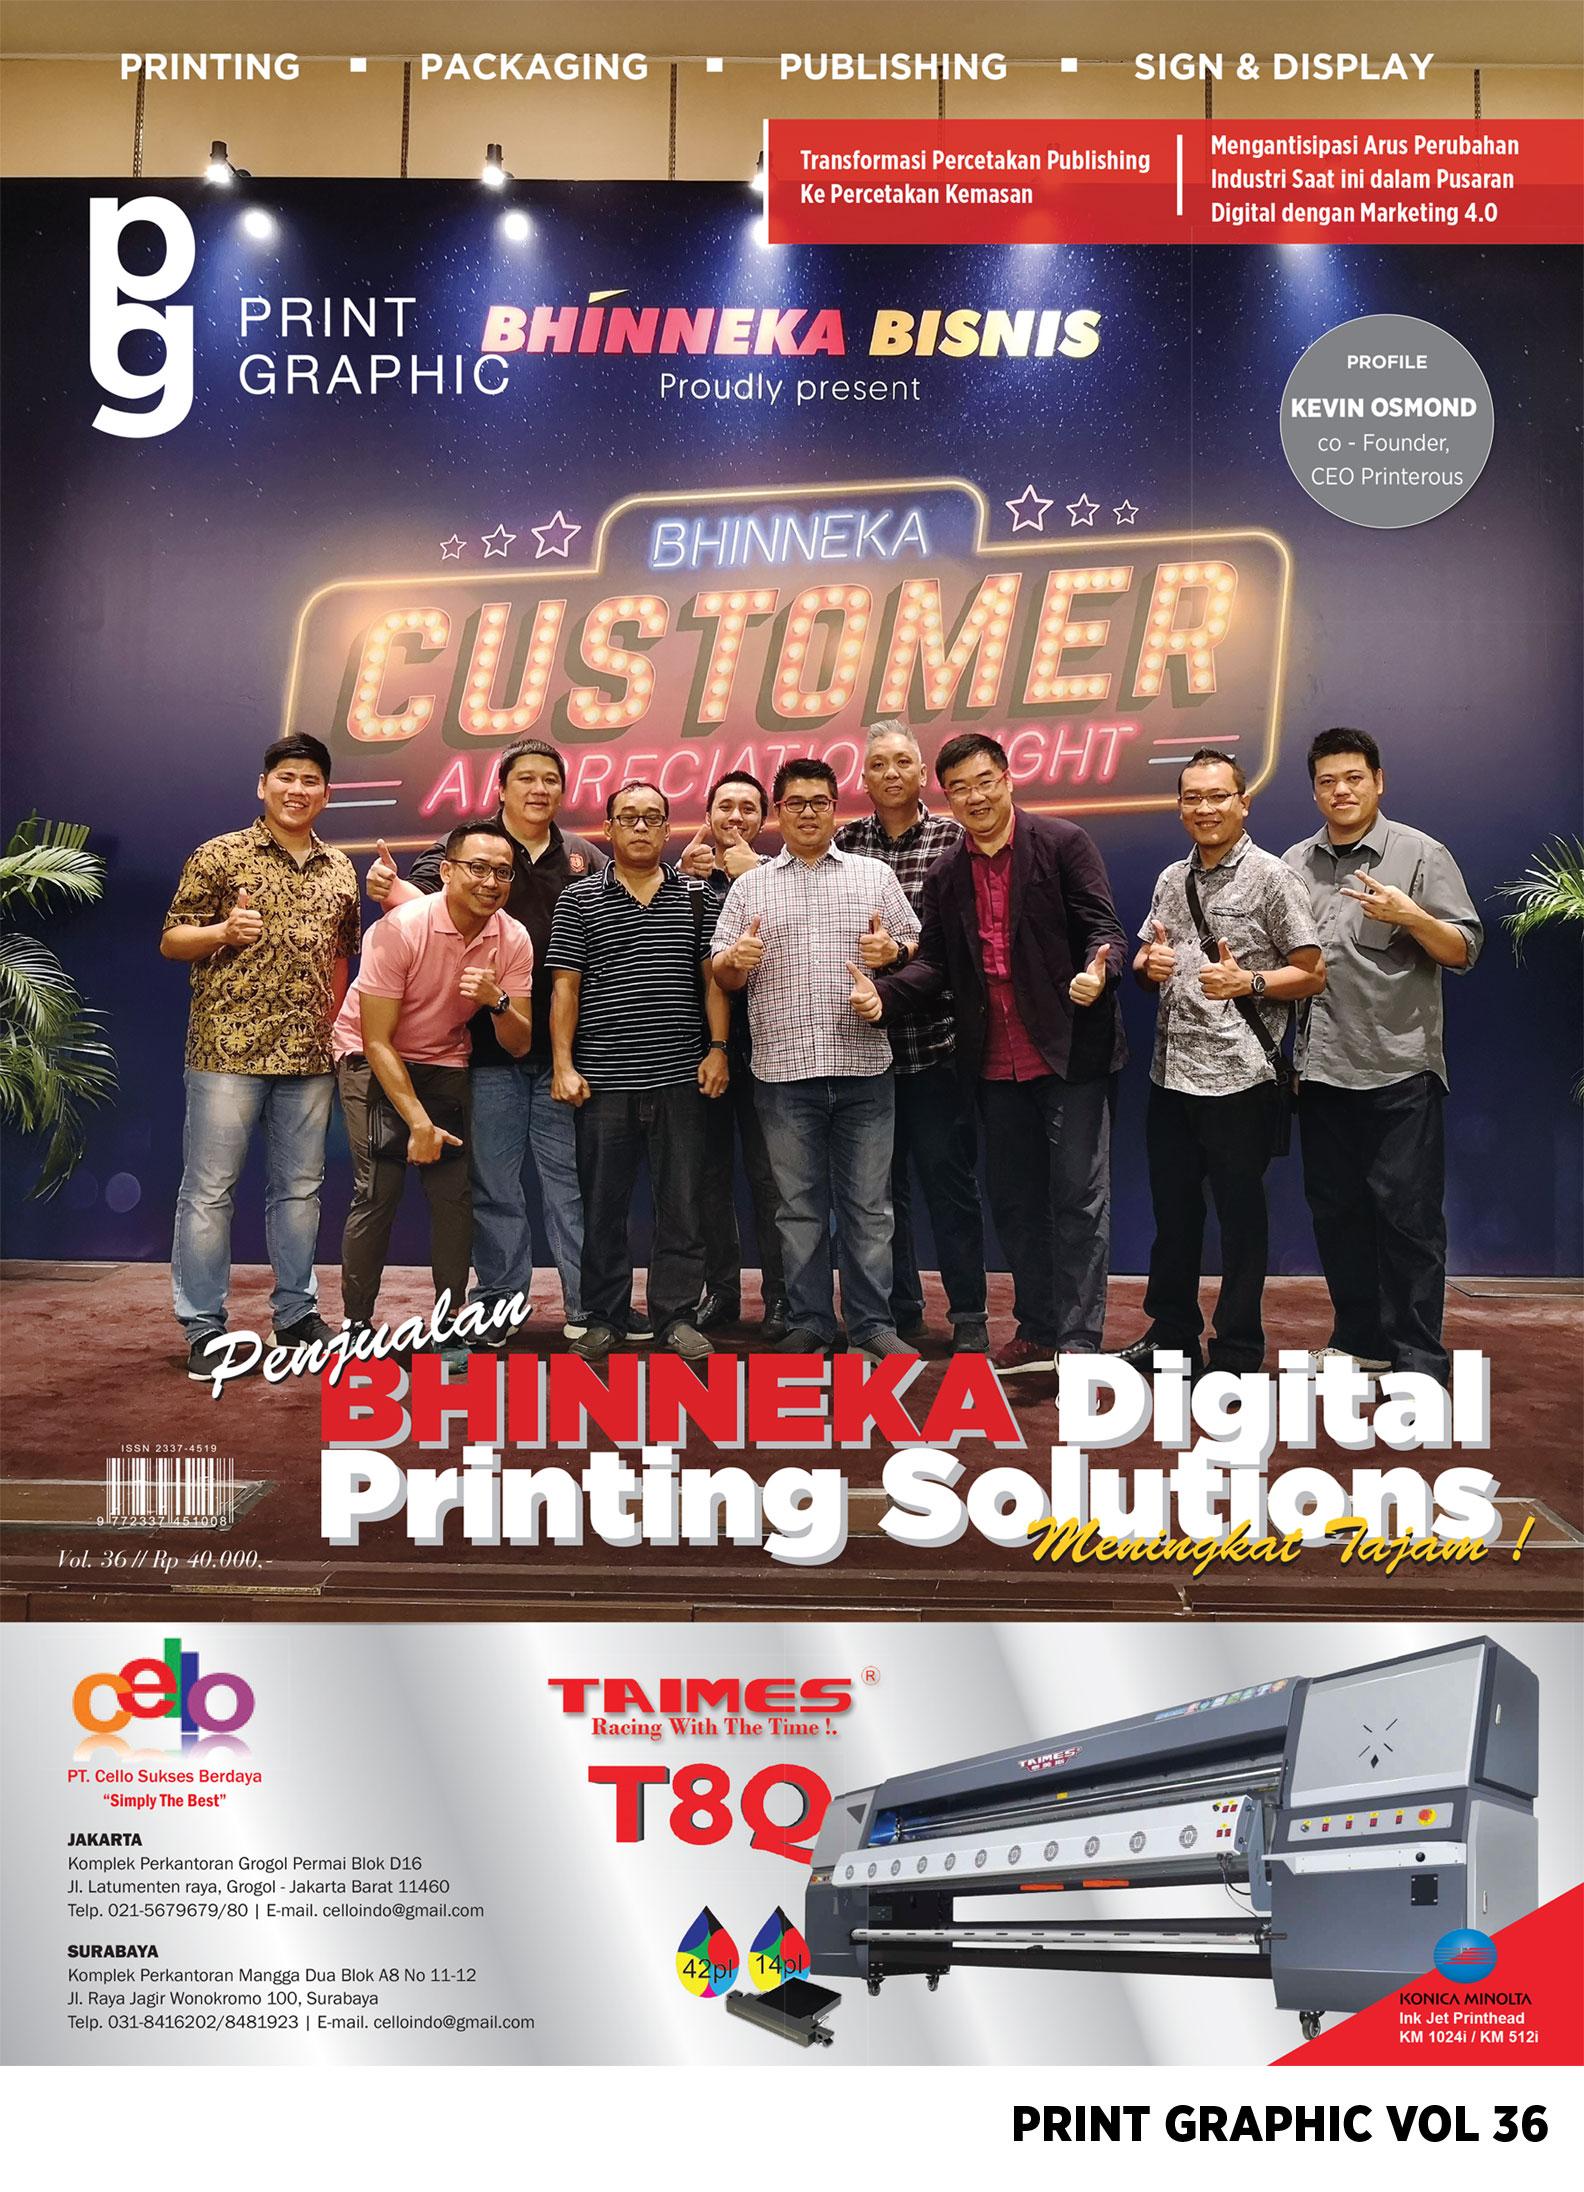 Customer Experience Center Ricoh - Thailand